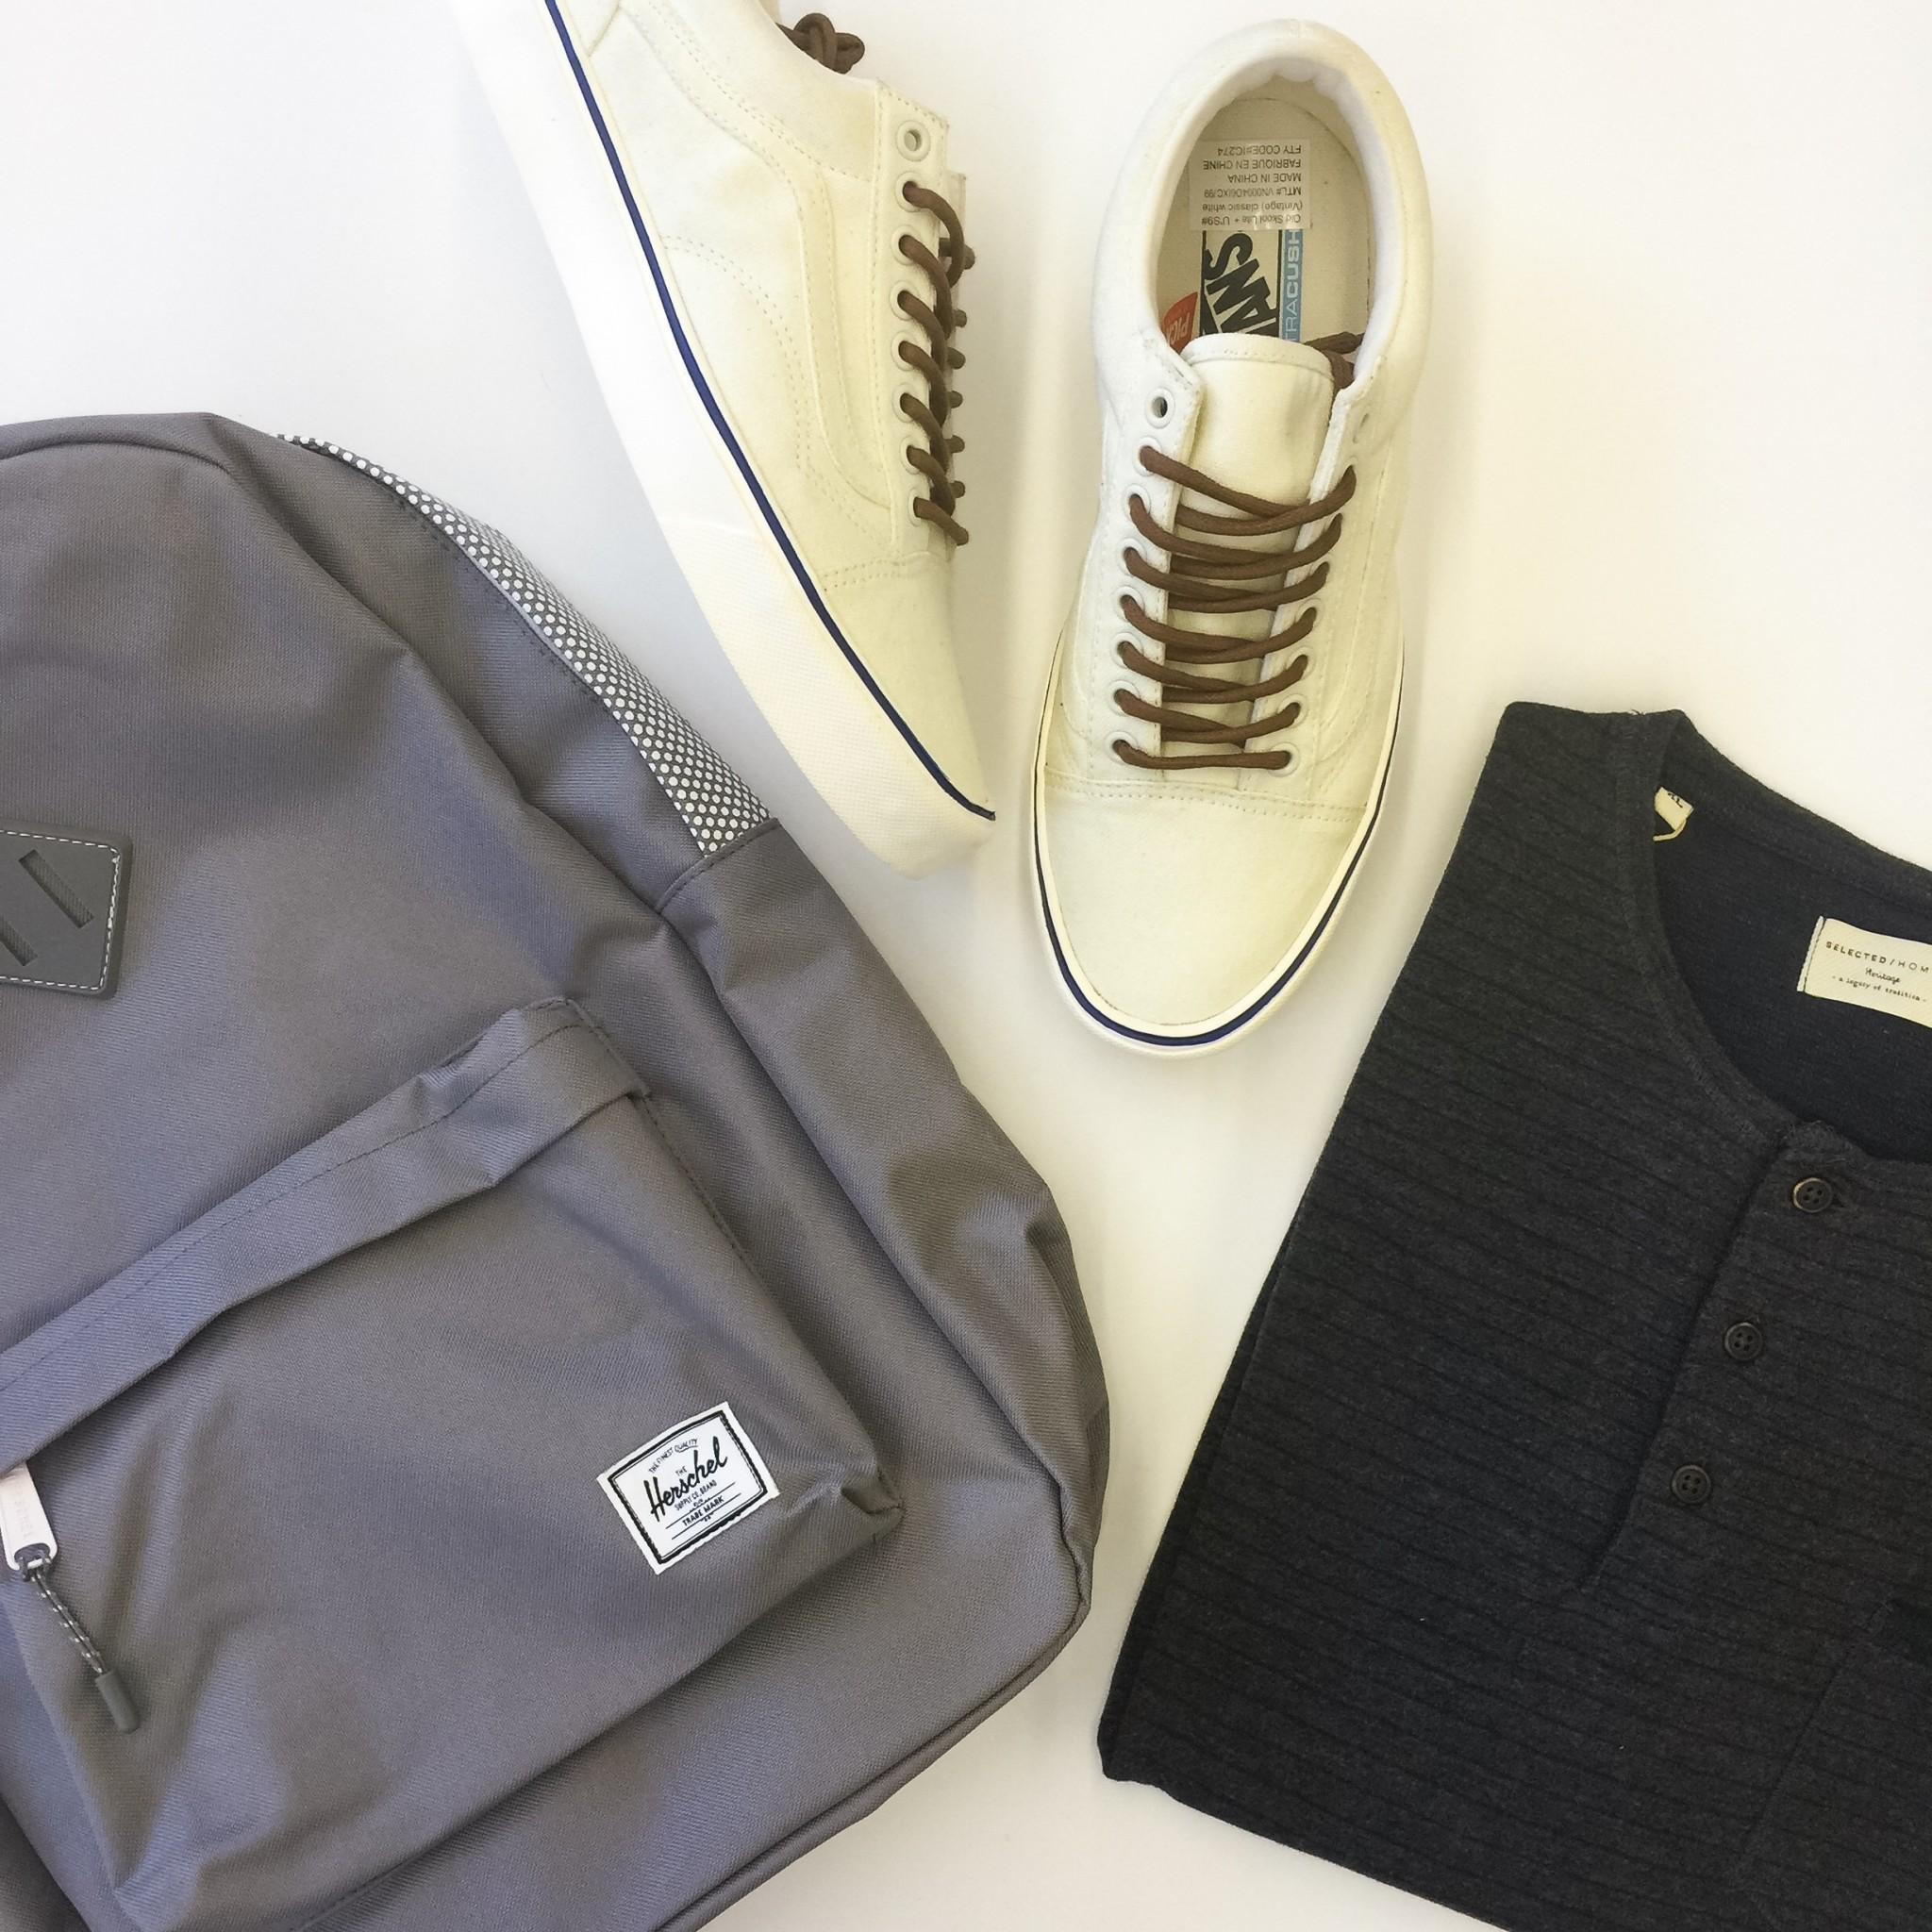 School essentials / Plenty